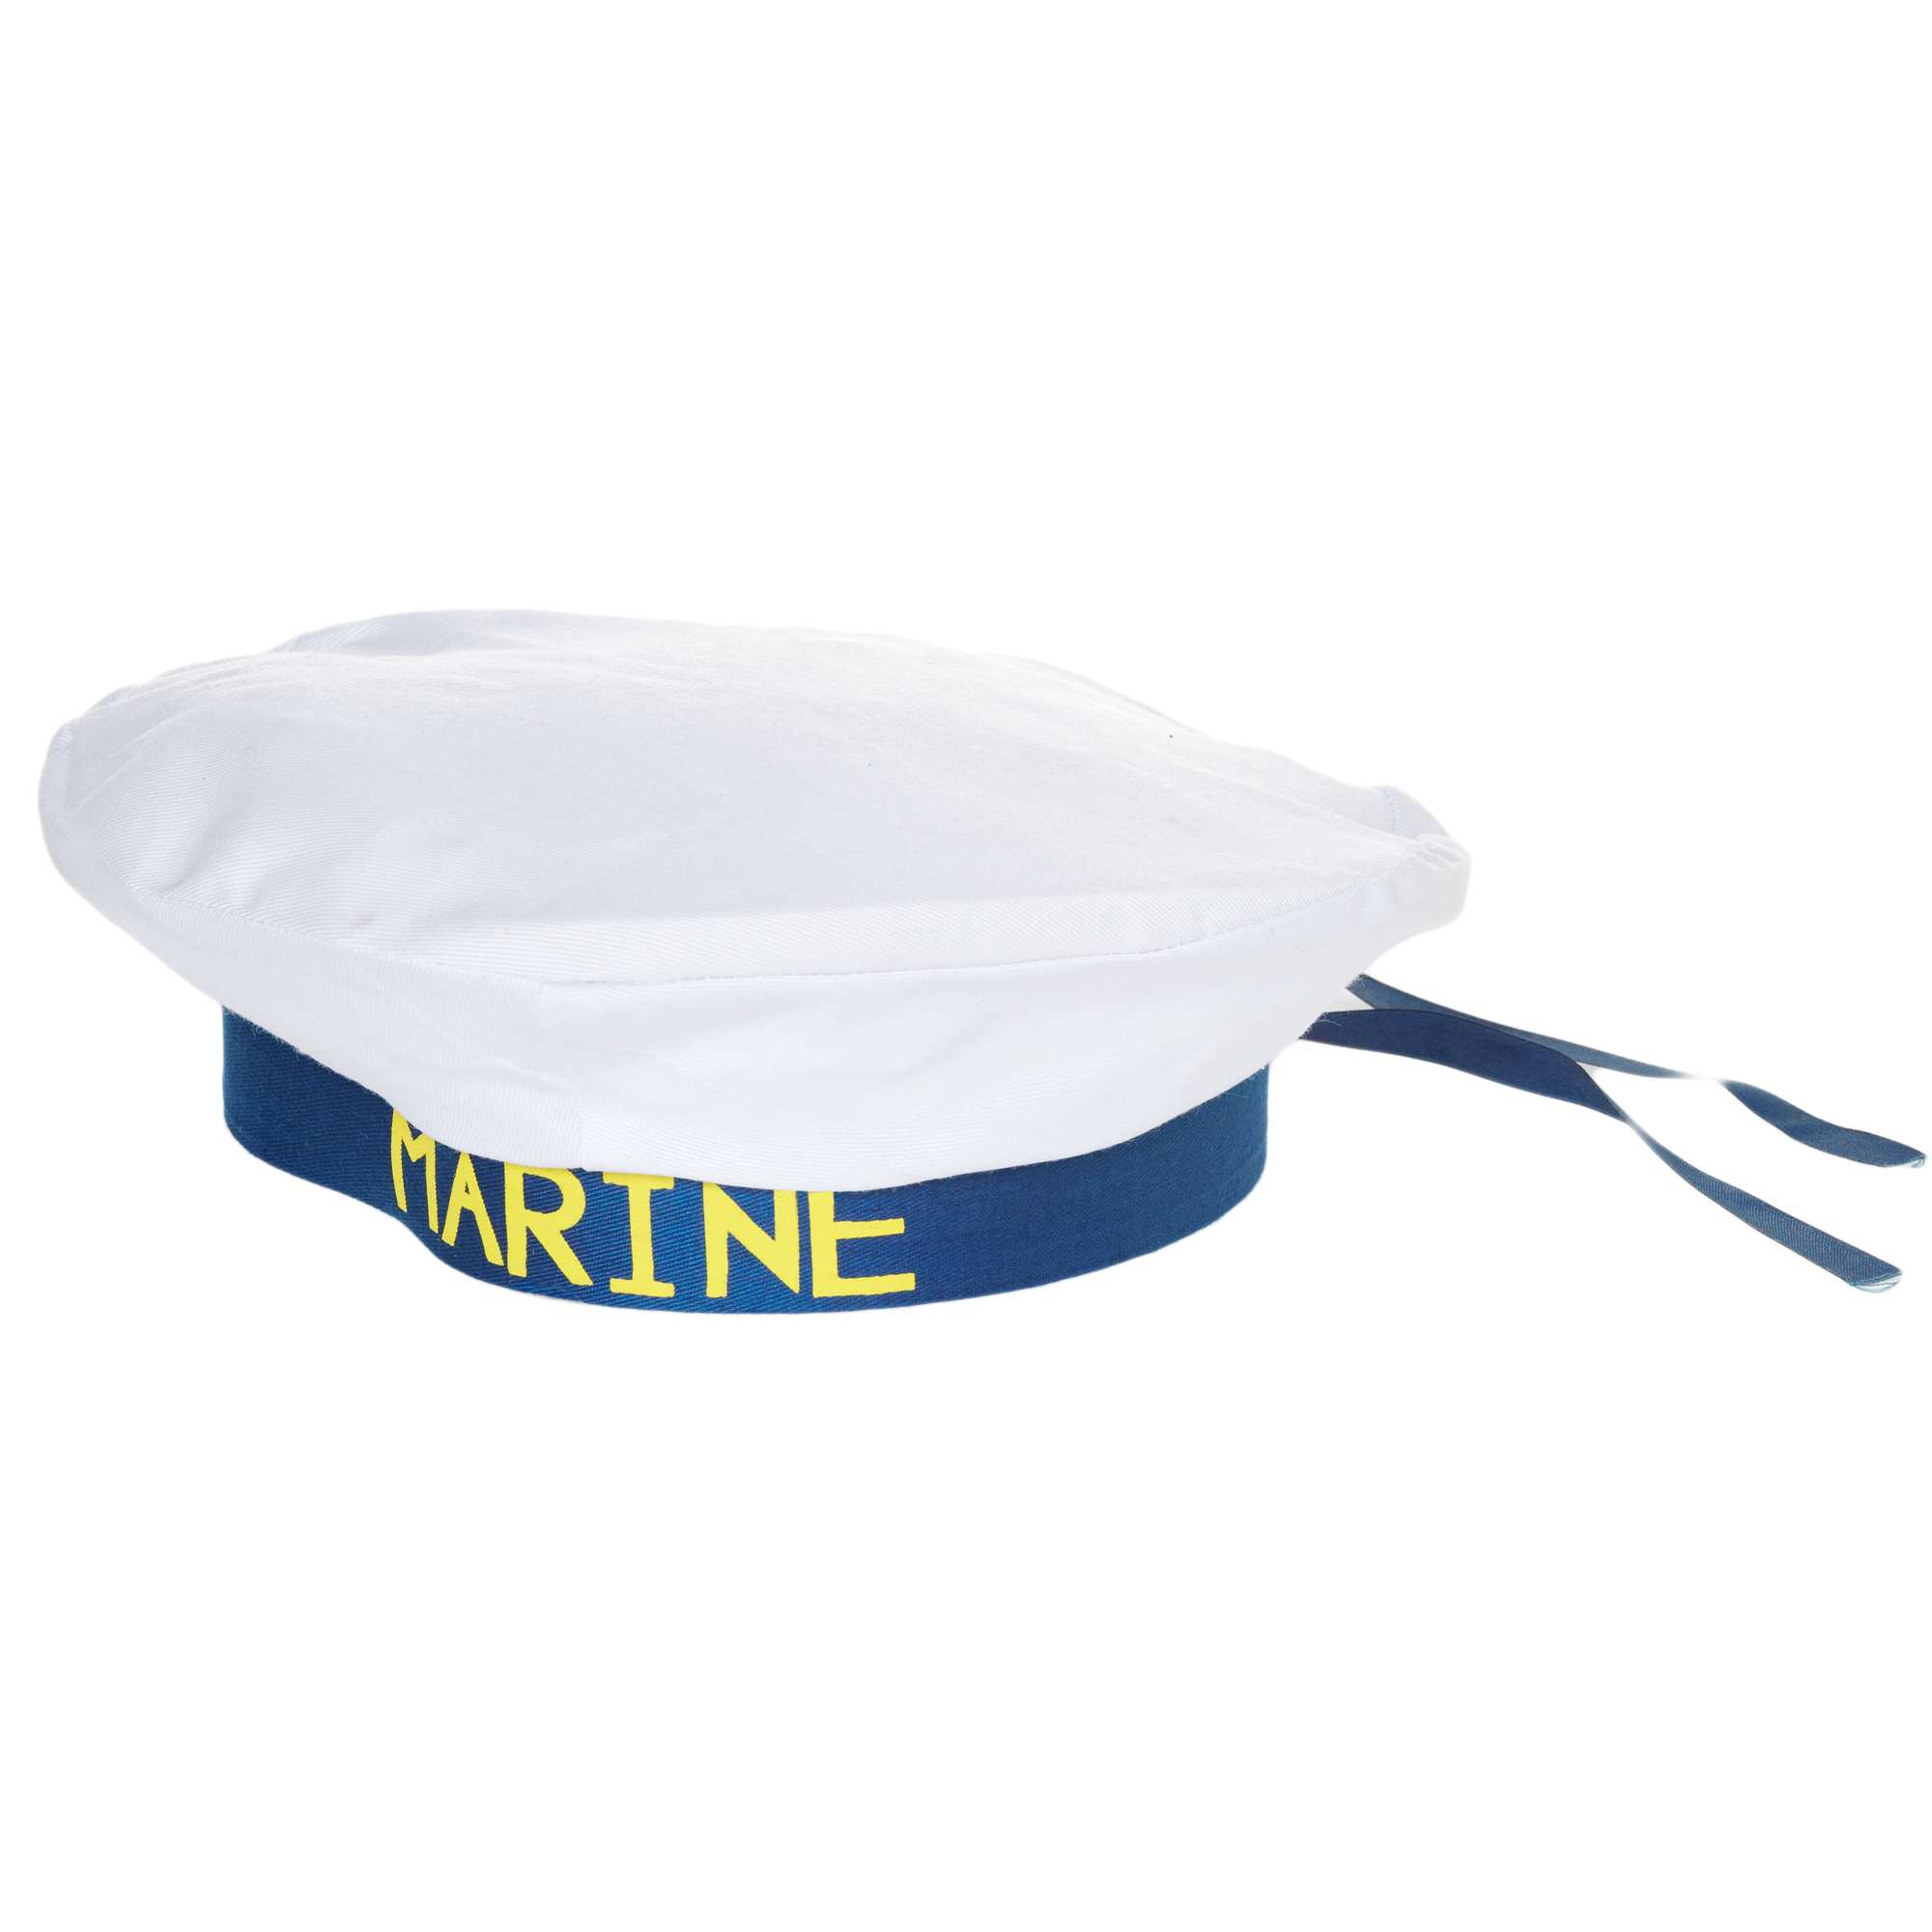 35b176f0060df Gorro marinero Accesorios - blanco azul - Kiabi - 4